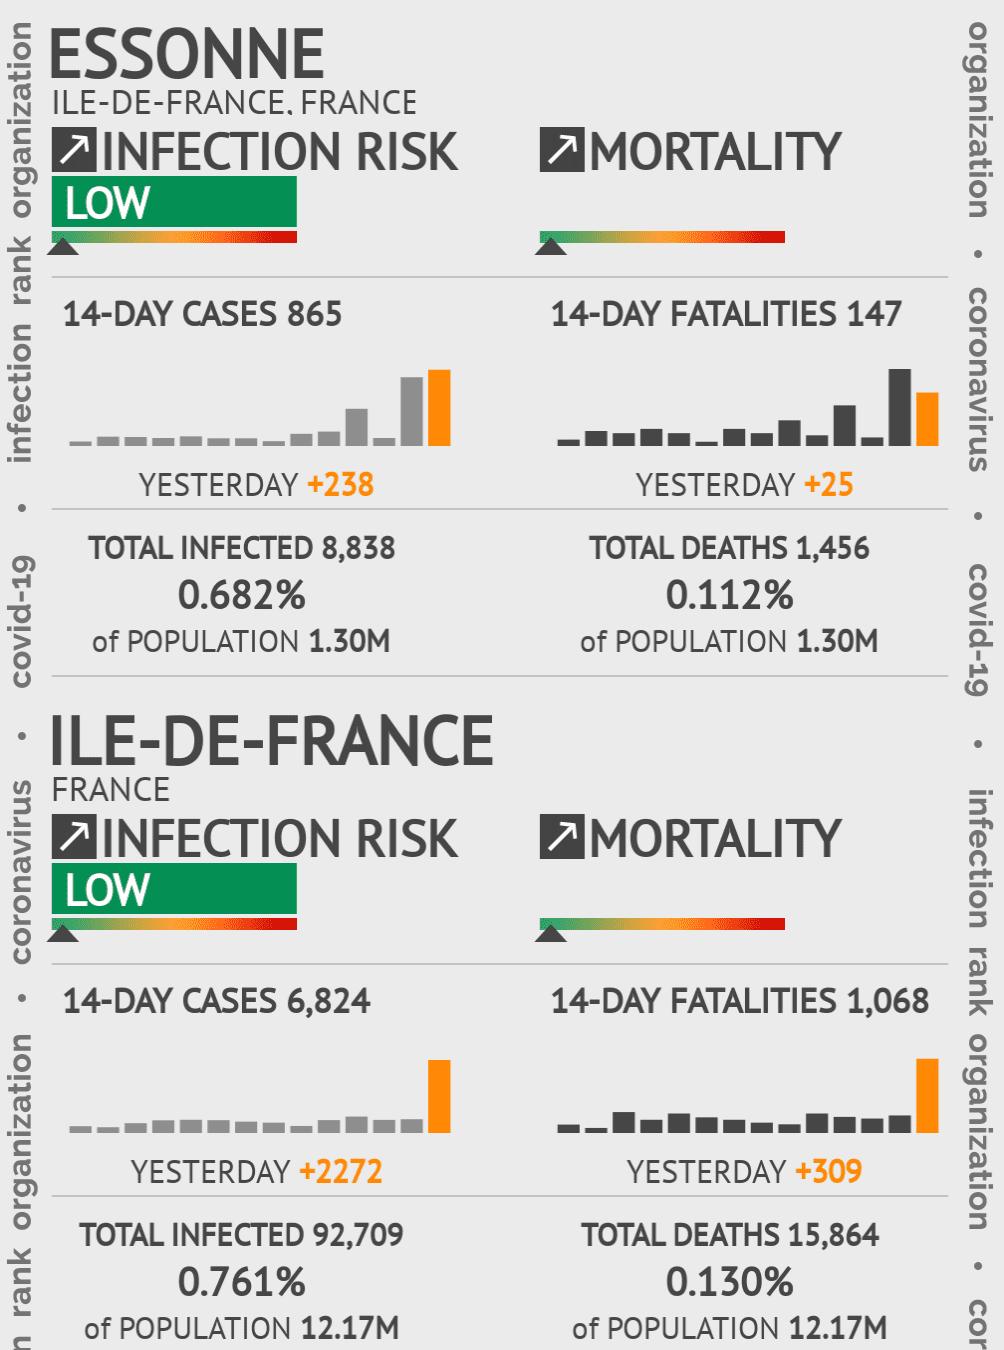 Essonne Coronavirus Covid-19 Risk of Infection on February 25, 2021